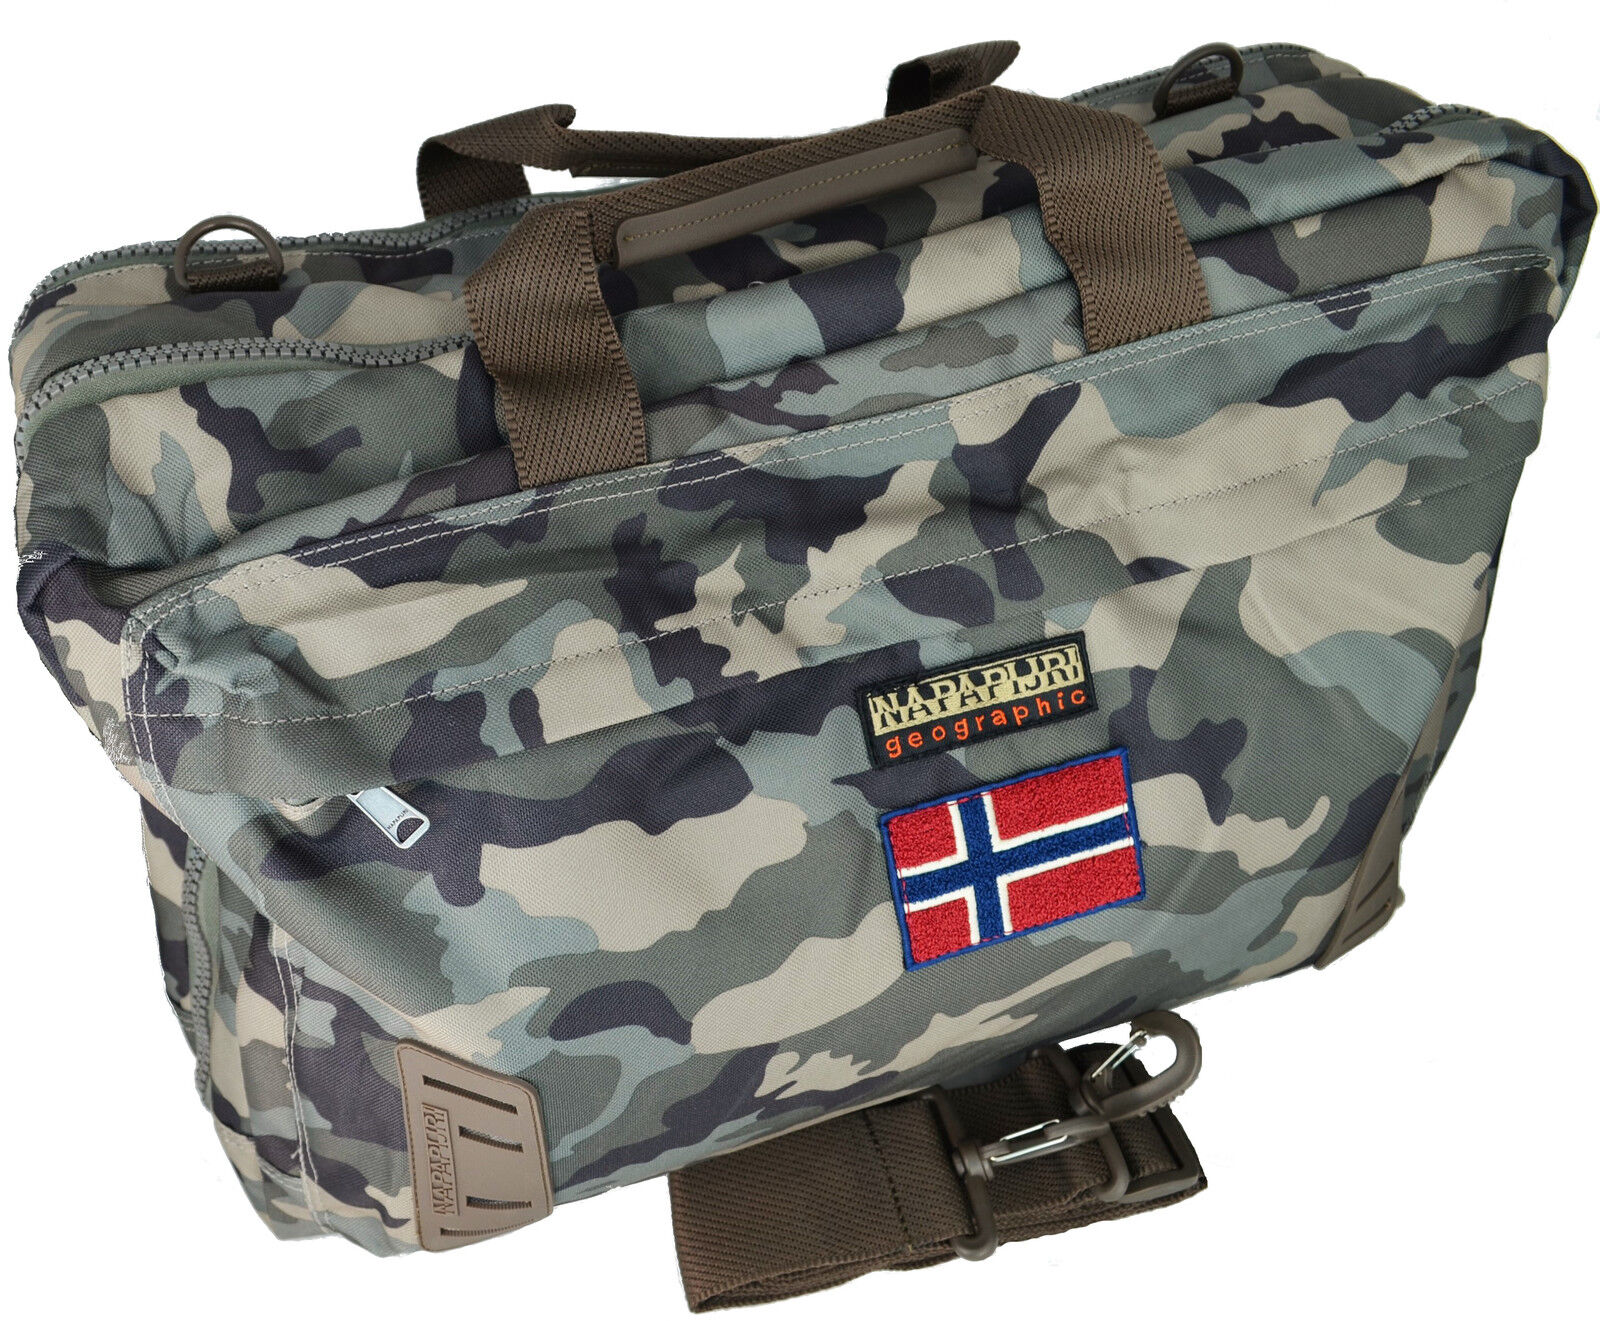 Tasche Rucksack Umhängetasche Mann Frau Mehrfarbig Napapijri Bag Nordland